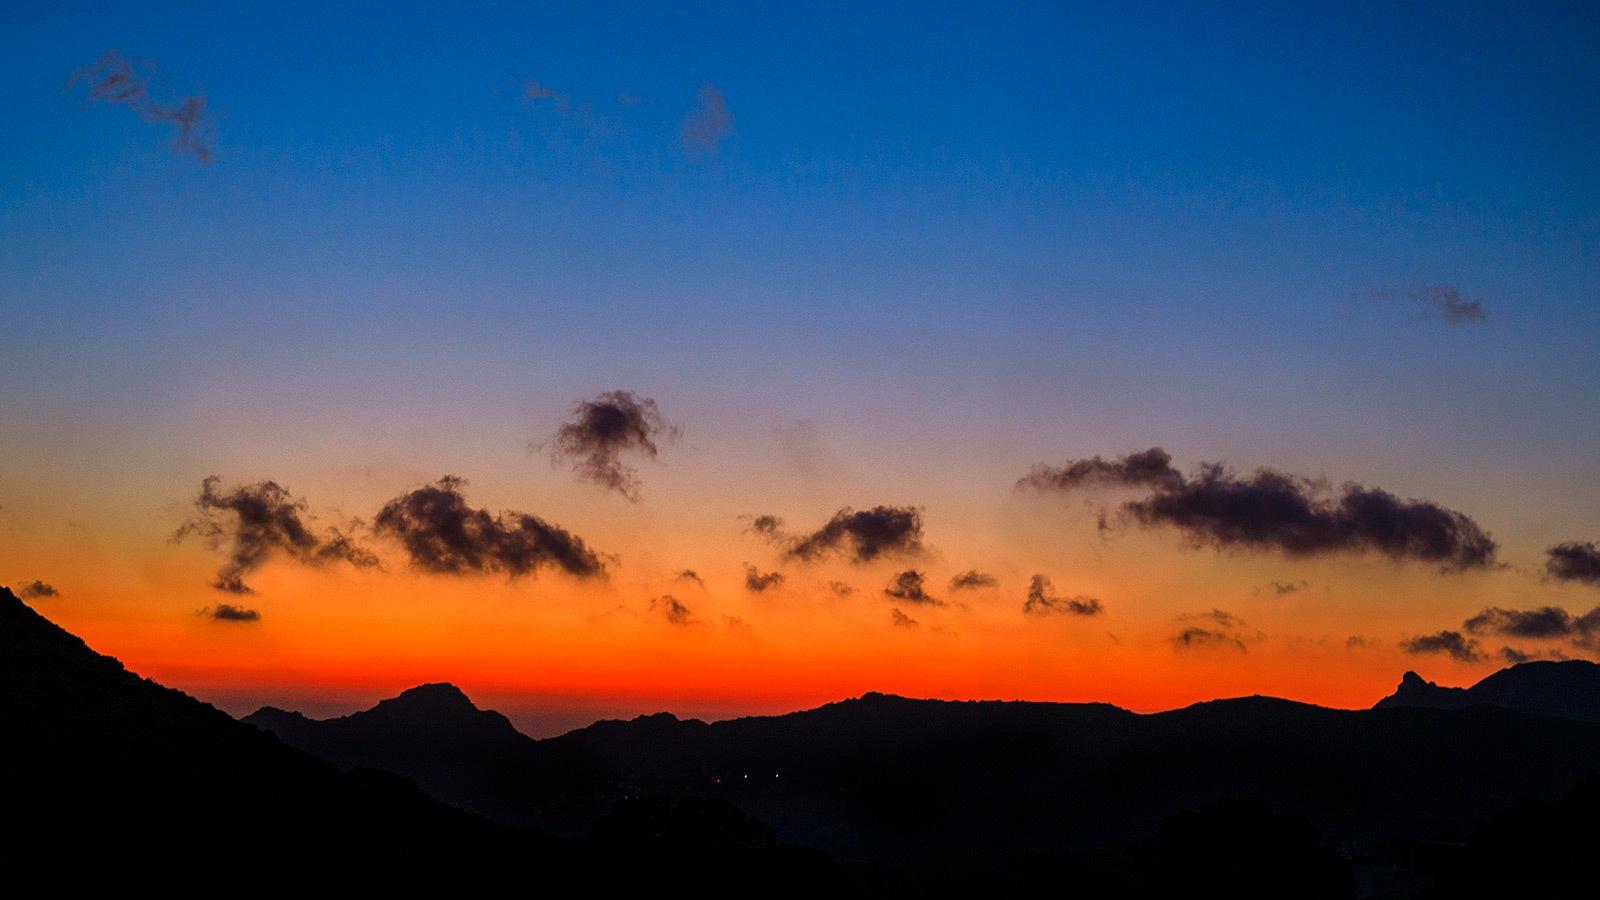 Sunset over the mountain near Filoti  by Sotiris Siomis